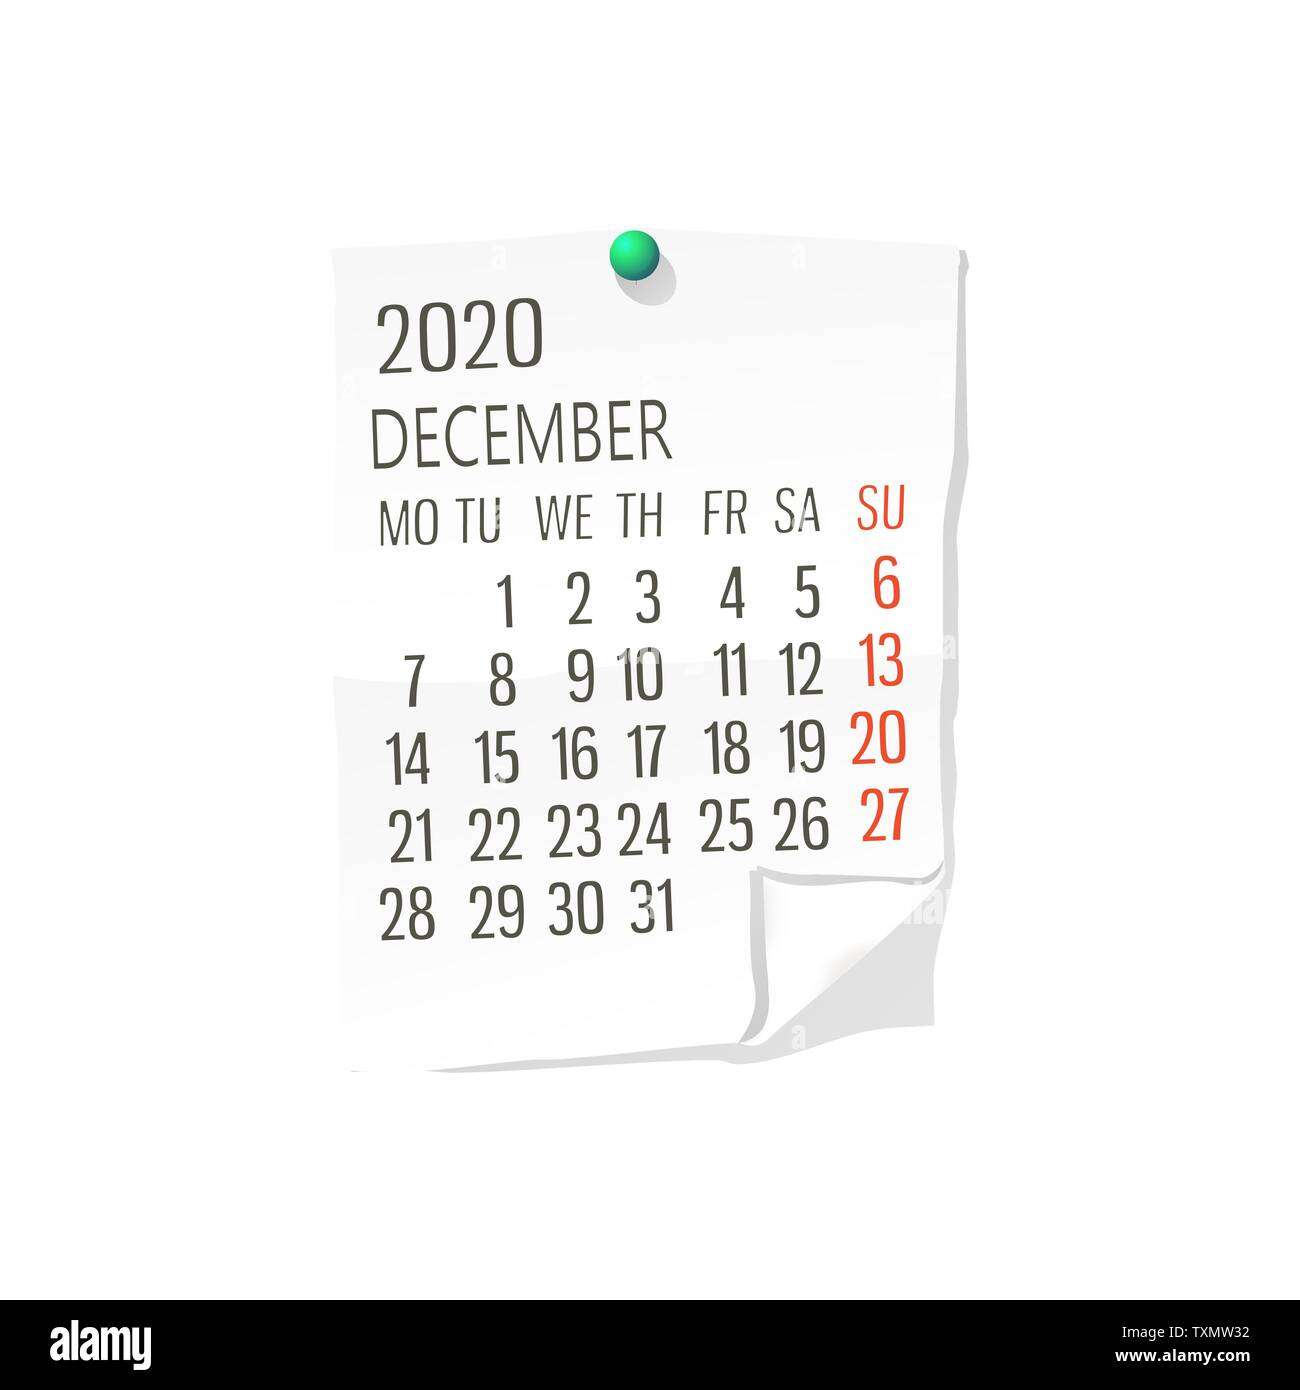 2020 December Calendar Background Vector calendar for December,2020 on white paper with holding pin